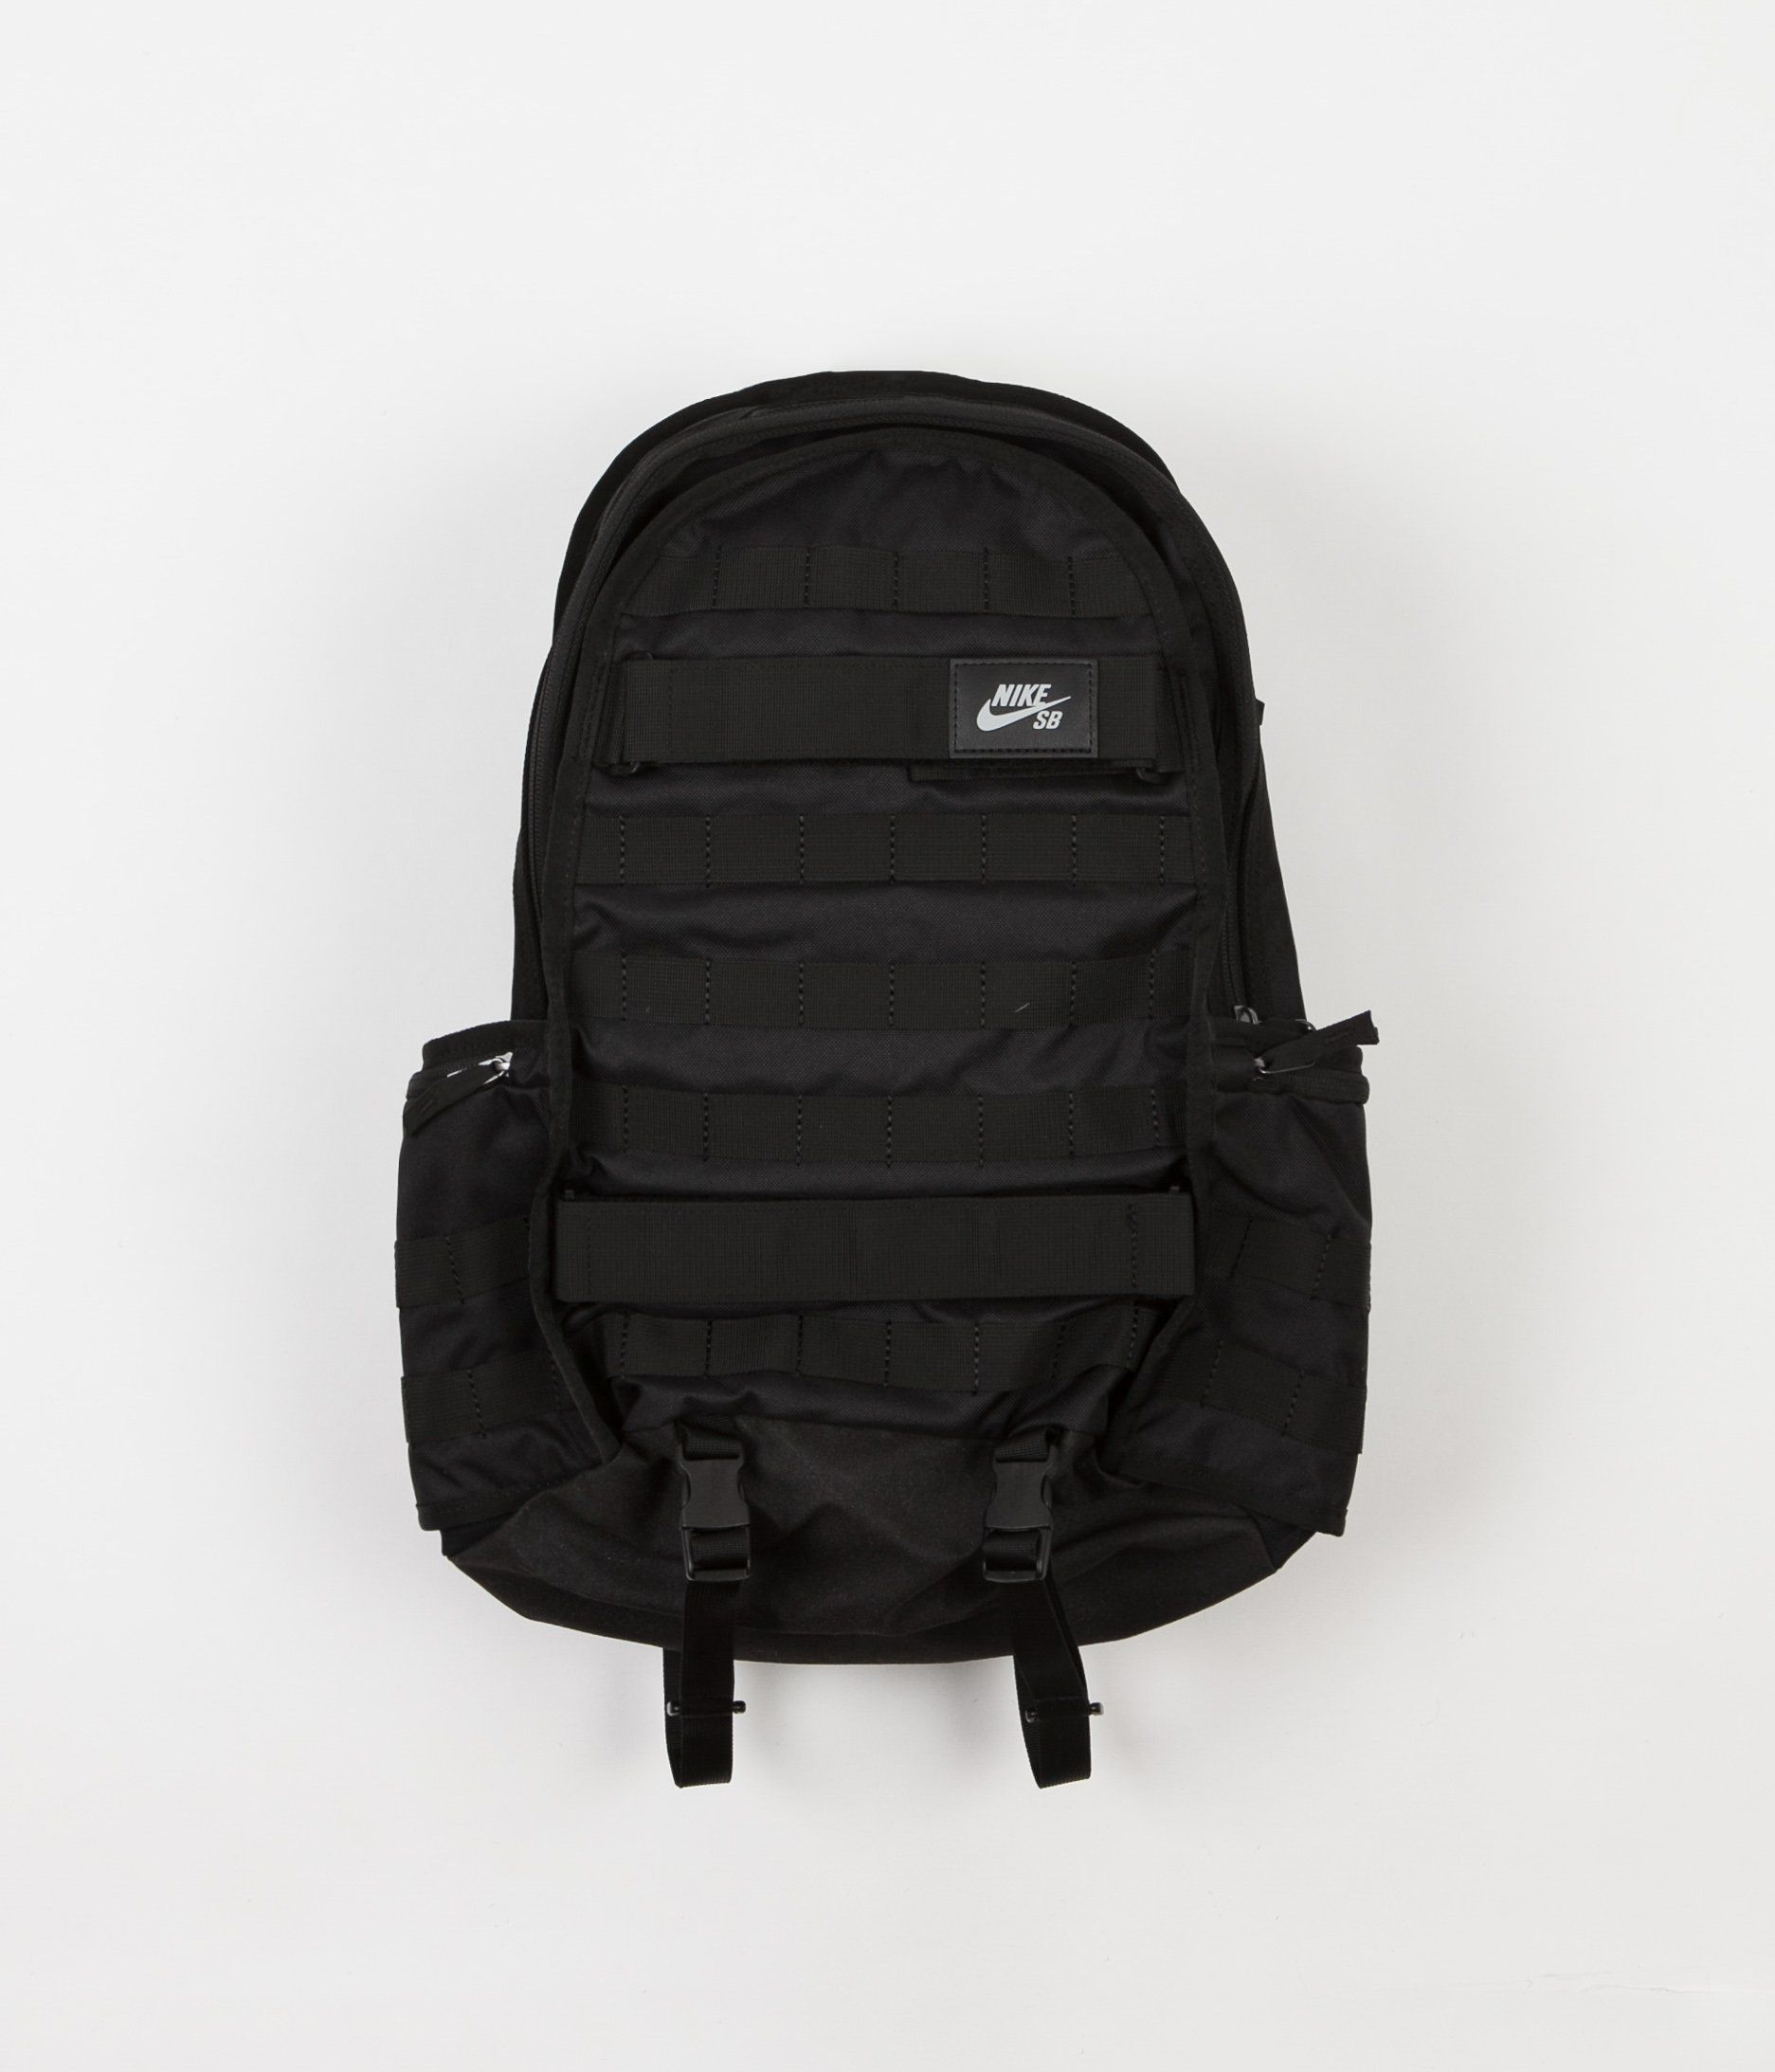 Nike SB RPM Backpack - Solid Black